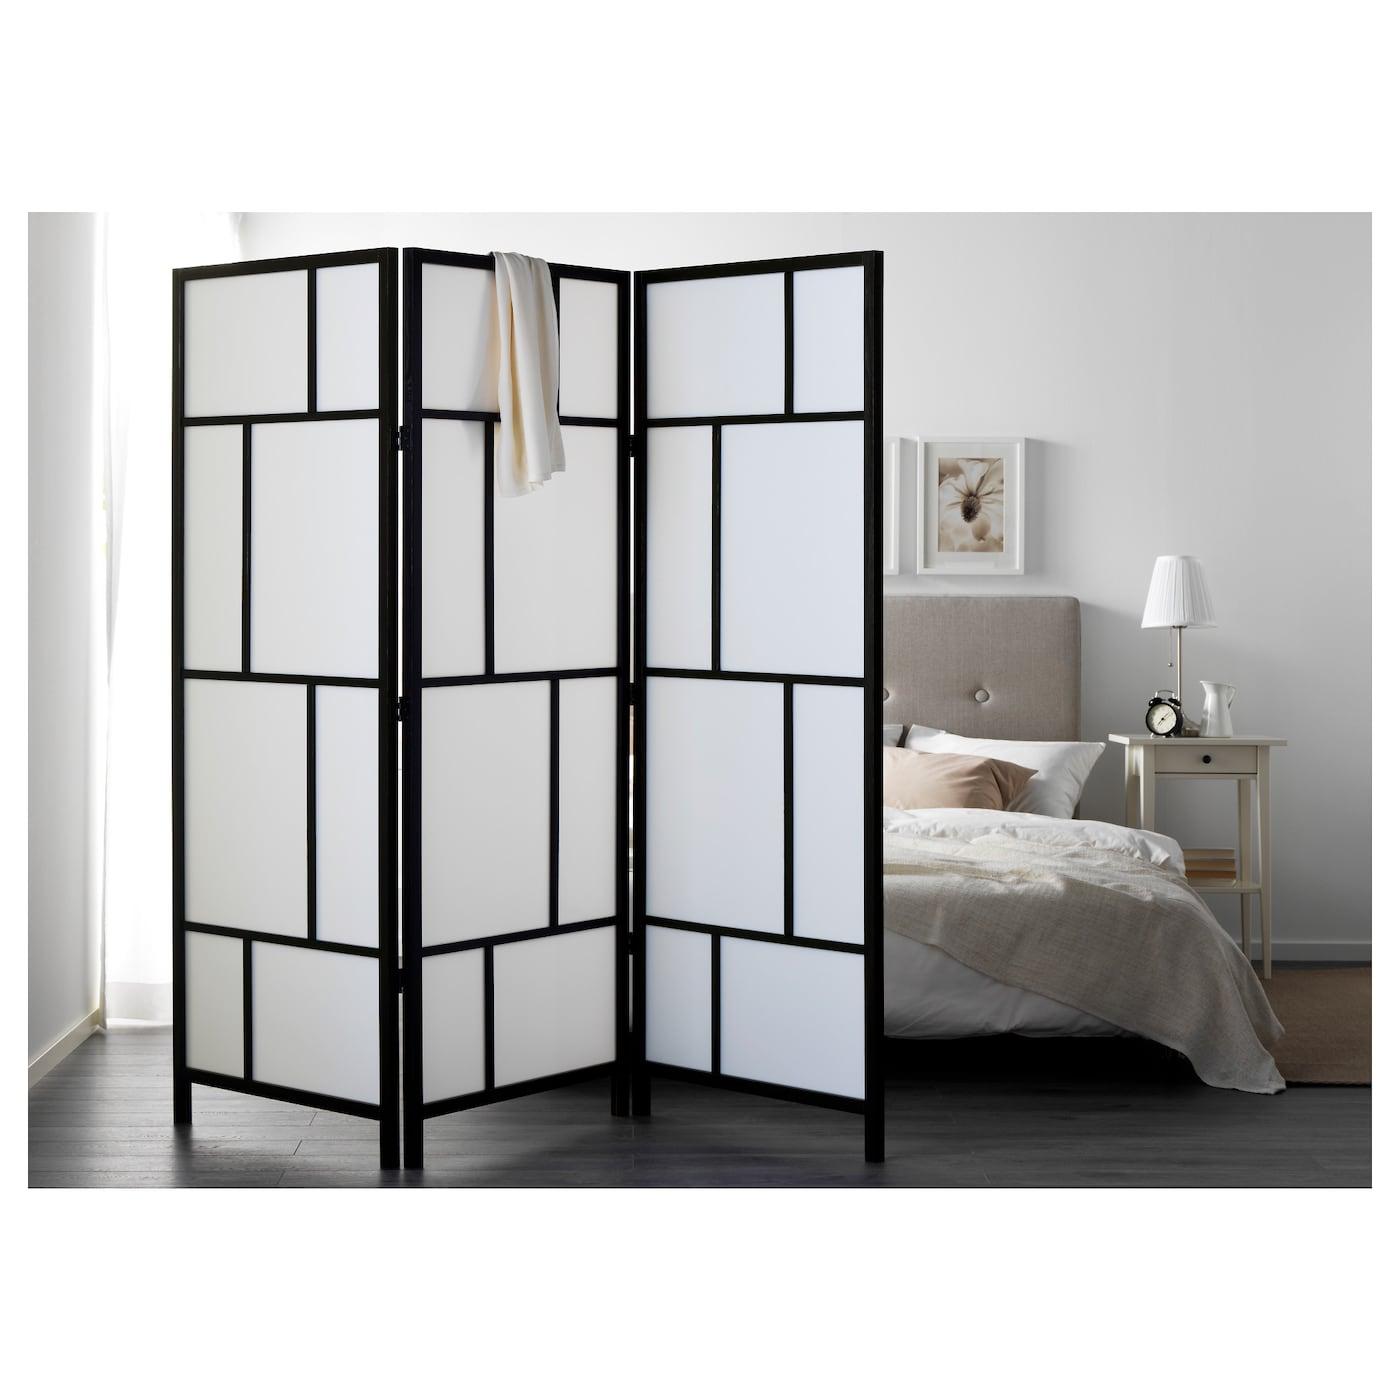 Brilliant Risor Room Divider White Black Download Free Architecture Designs Fluibritishbridgeorg